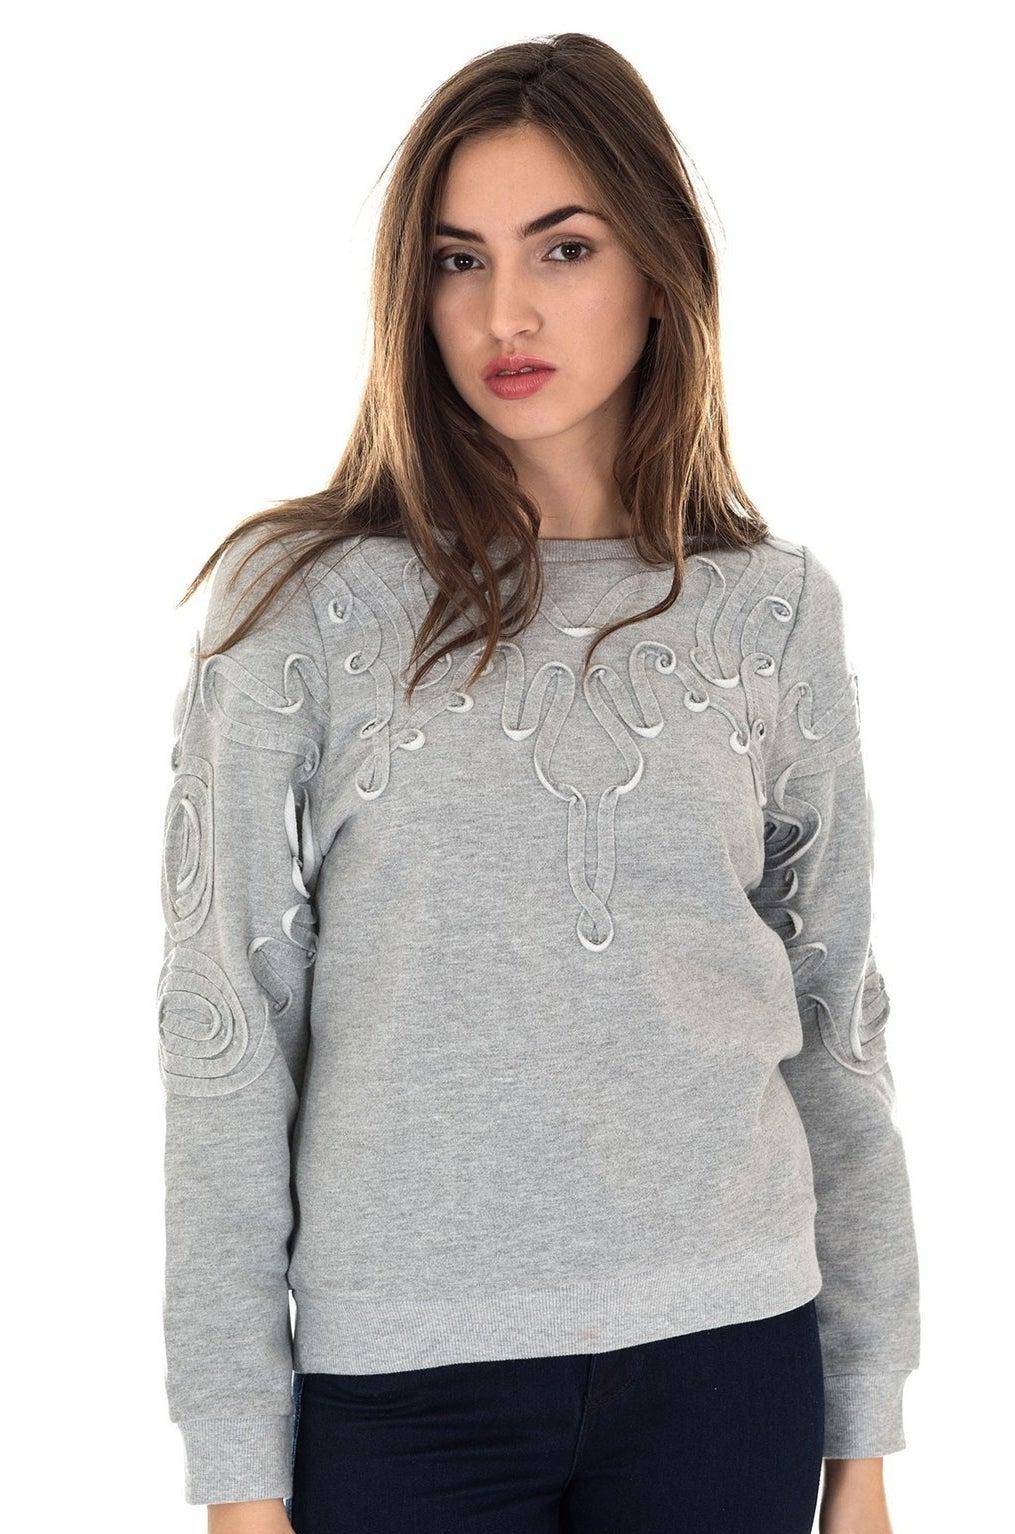 Vila Solo Sweatshirt, £35.00